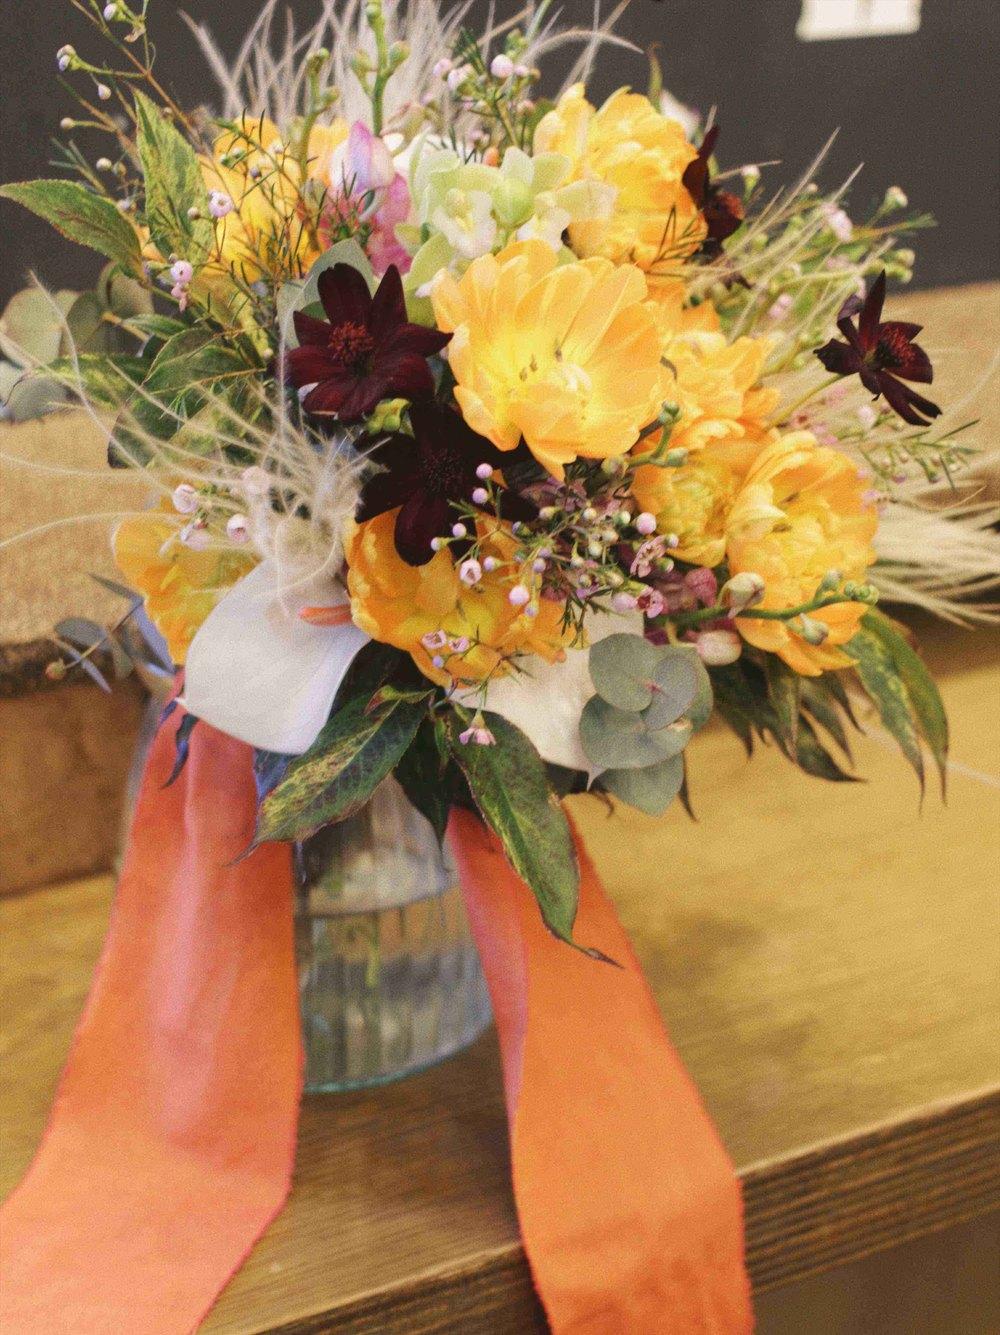 beek flowersオレンジのウェディングブーケ